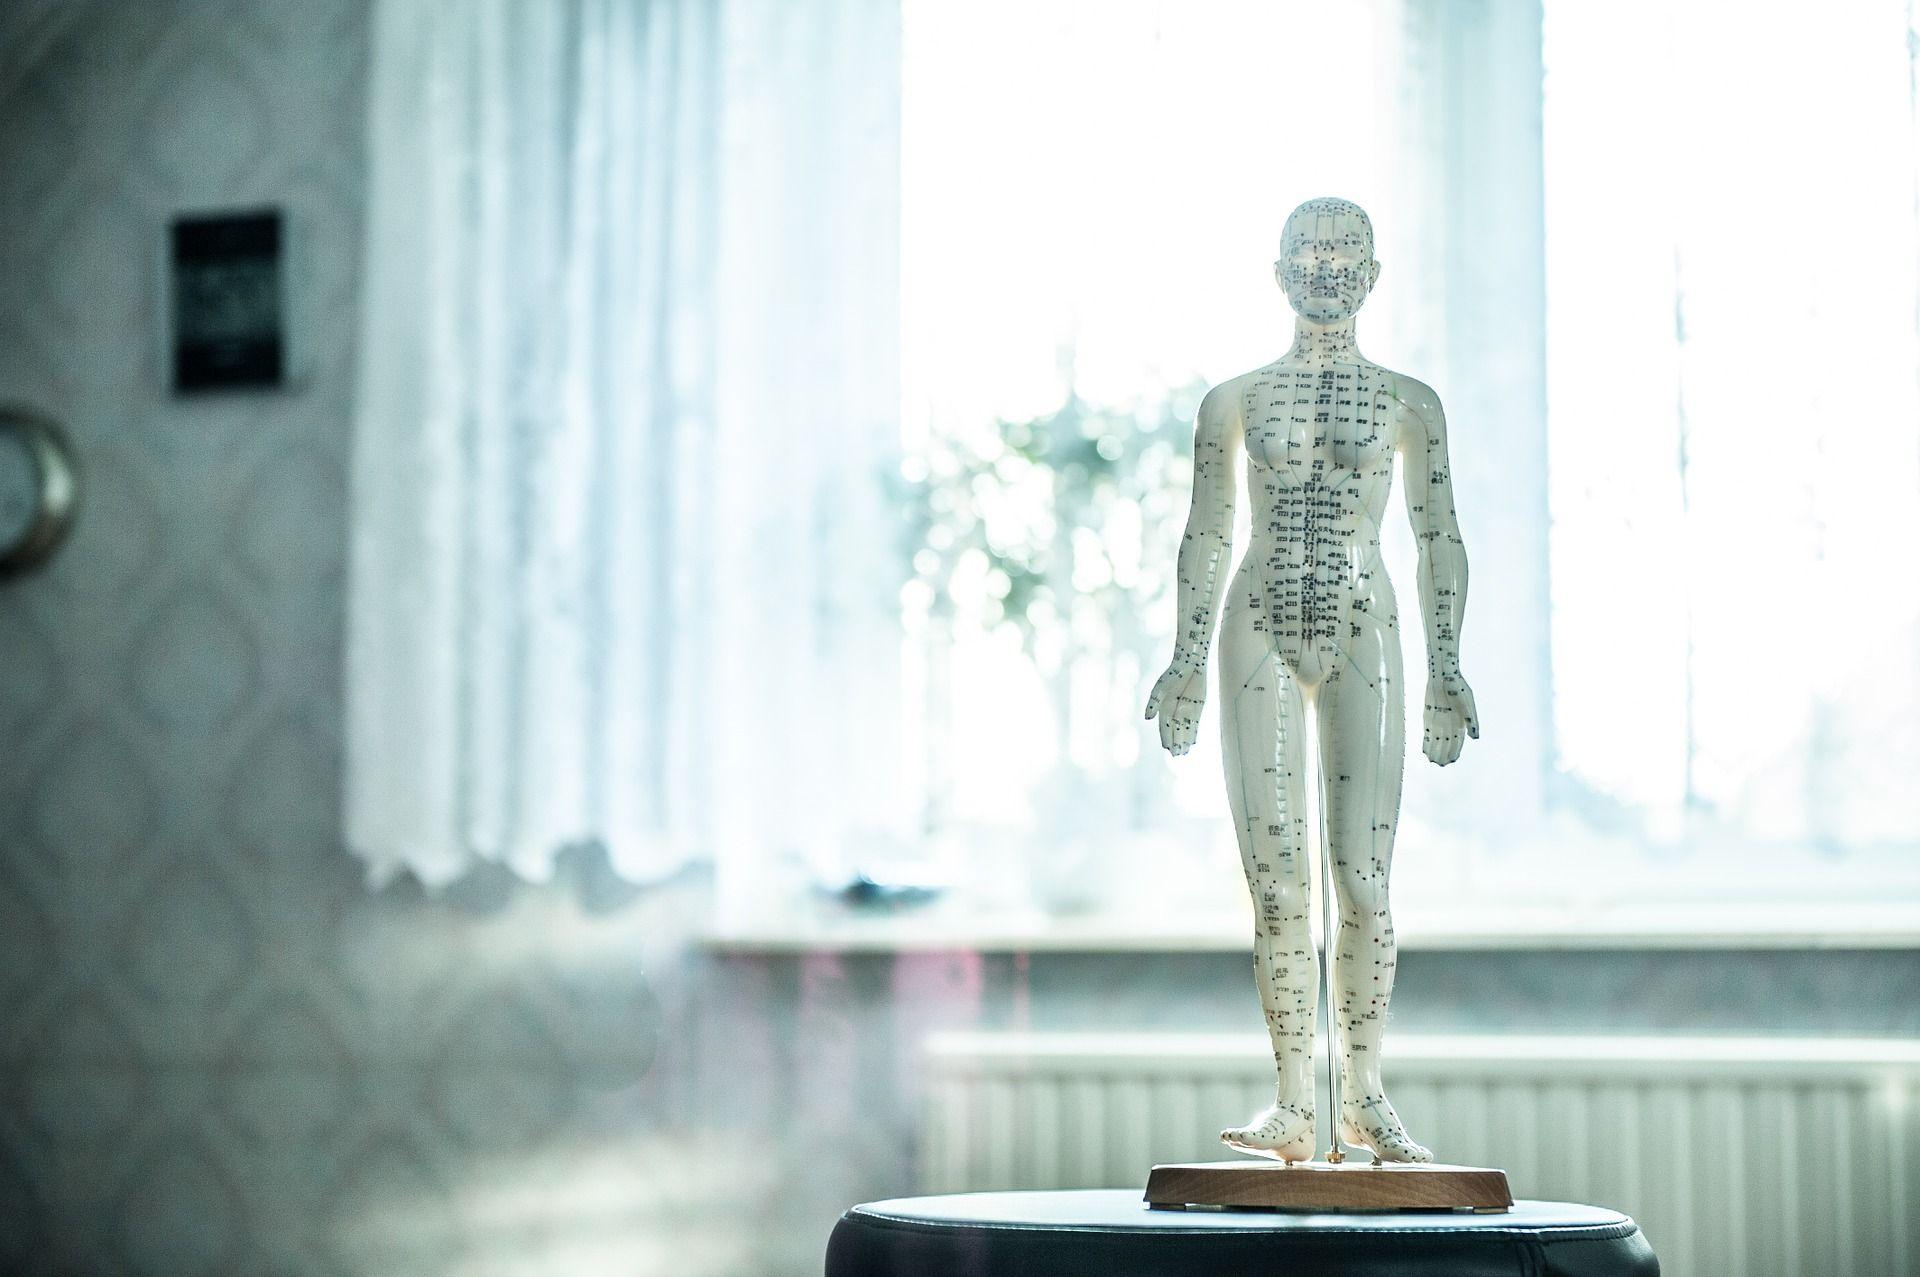 Centro osteopatía Santurtzi